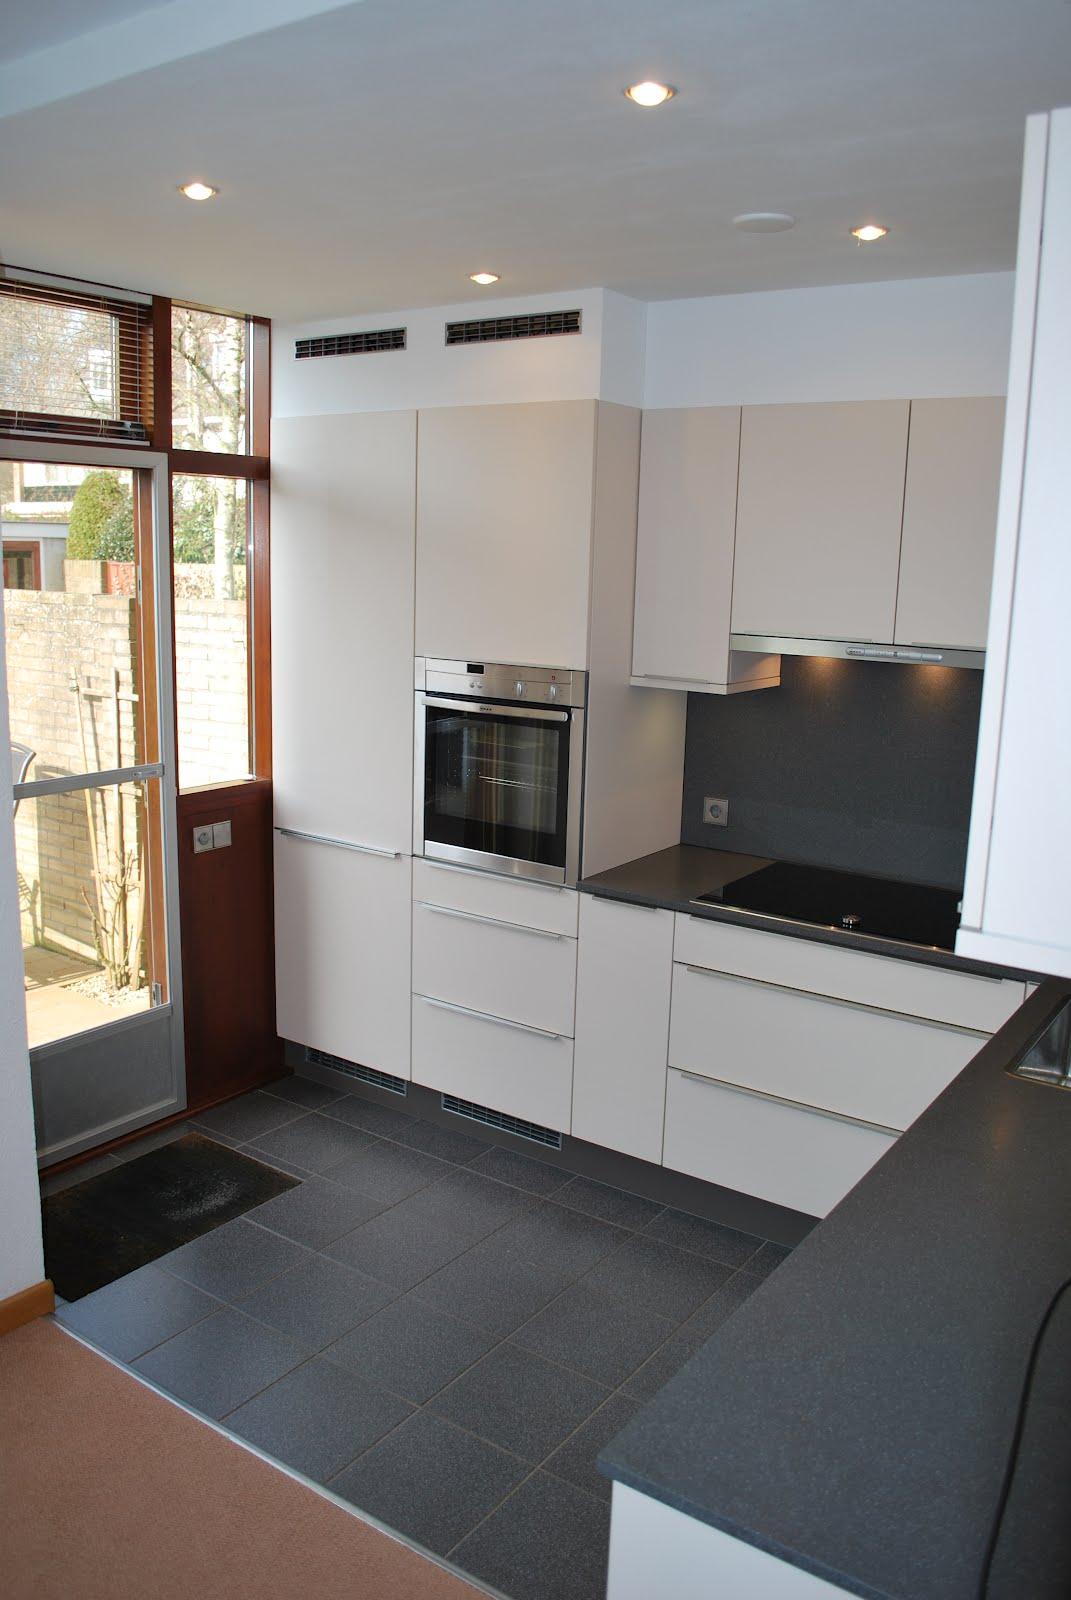 Keukenraam Inspiratie : Keuken Ohmstraat Badhoevedorp Gp Interieur Idee